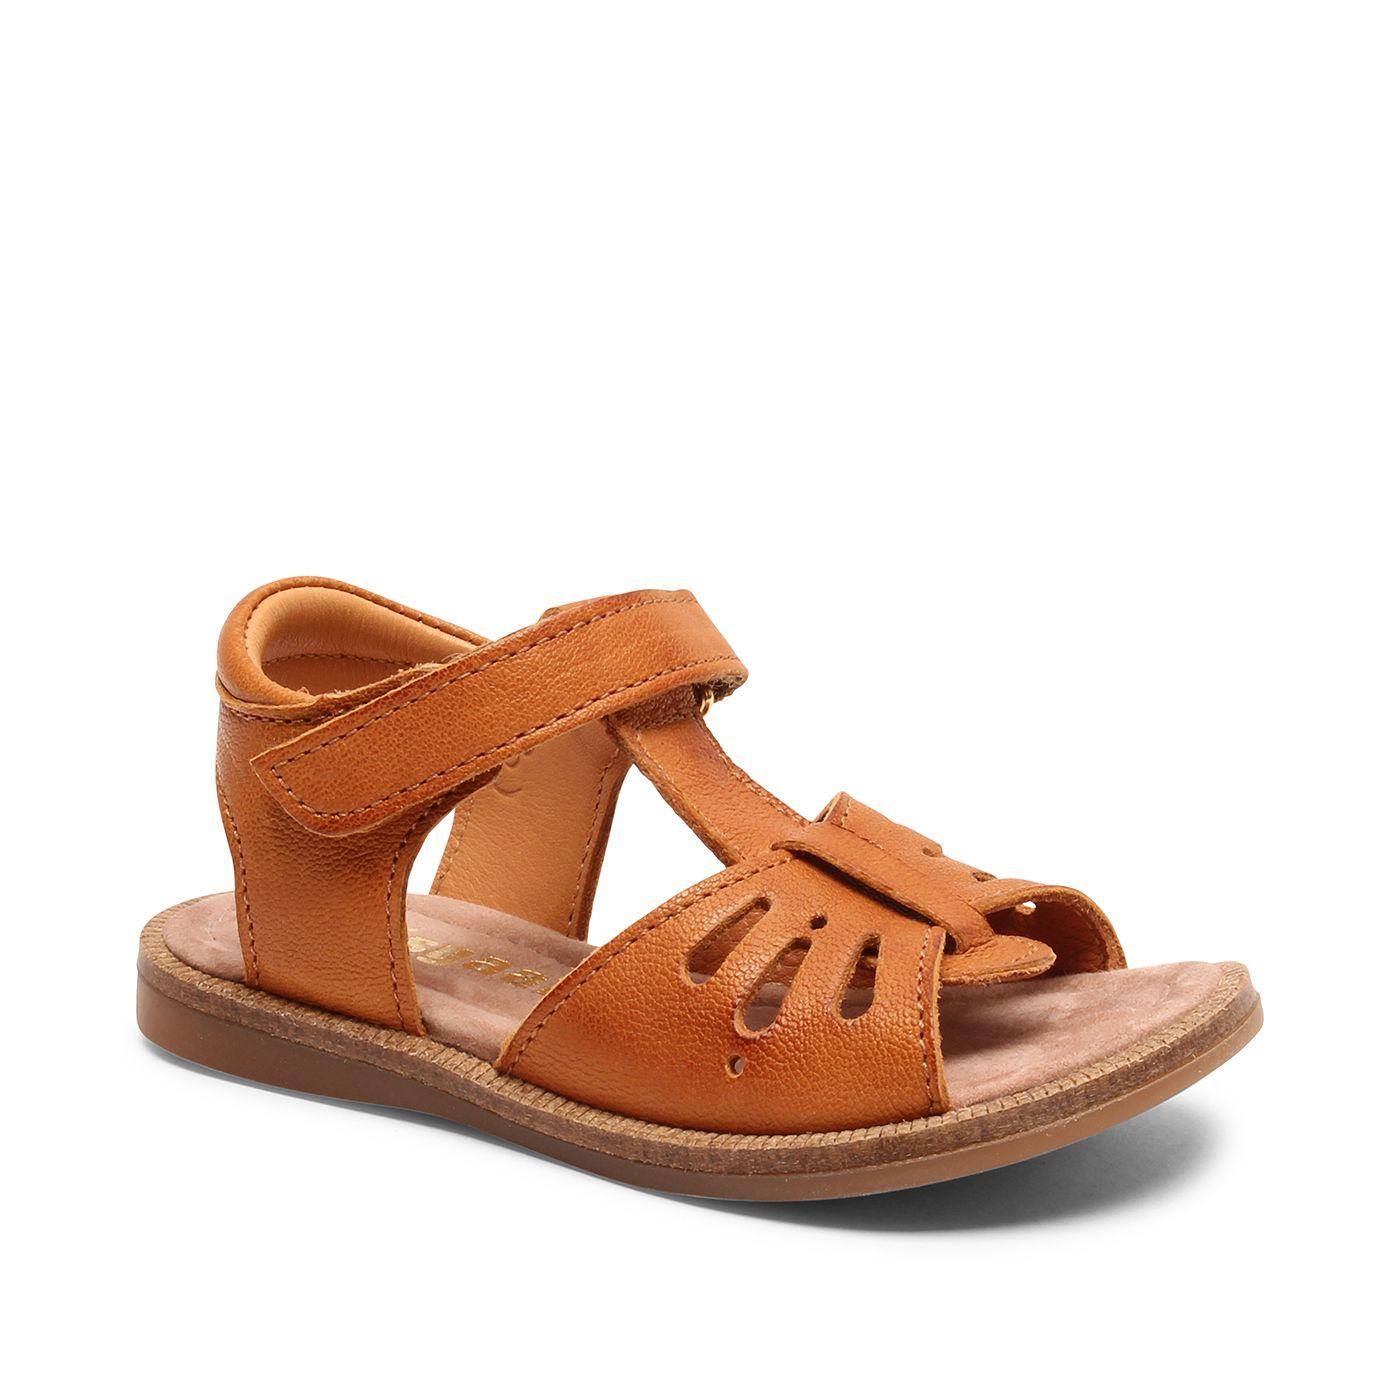 Bisgaard dívčí kožené sandály 70291 - 1335